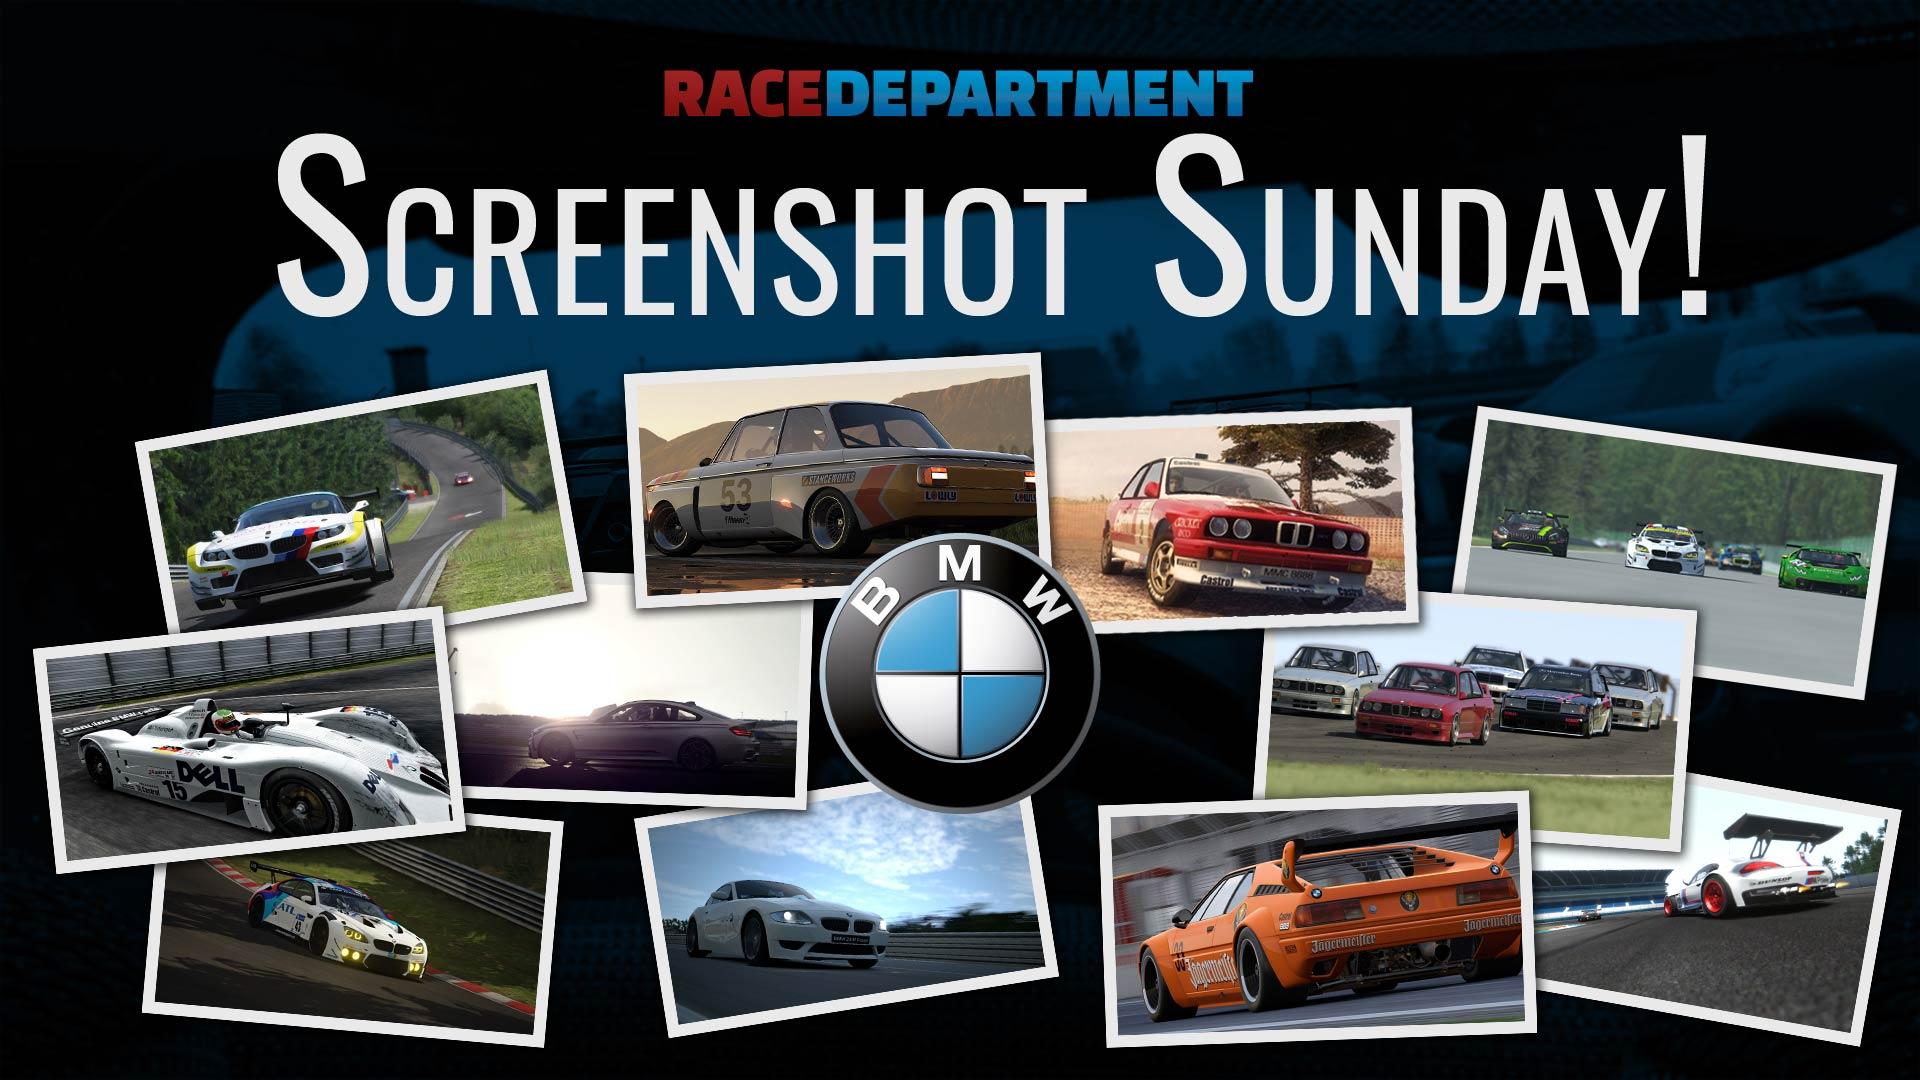 Screenshot Sunday - BMW.jpg